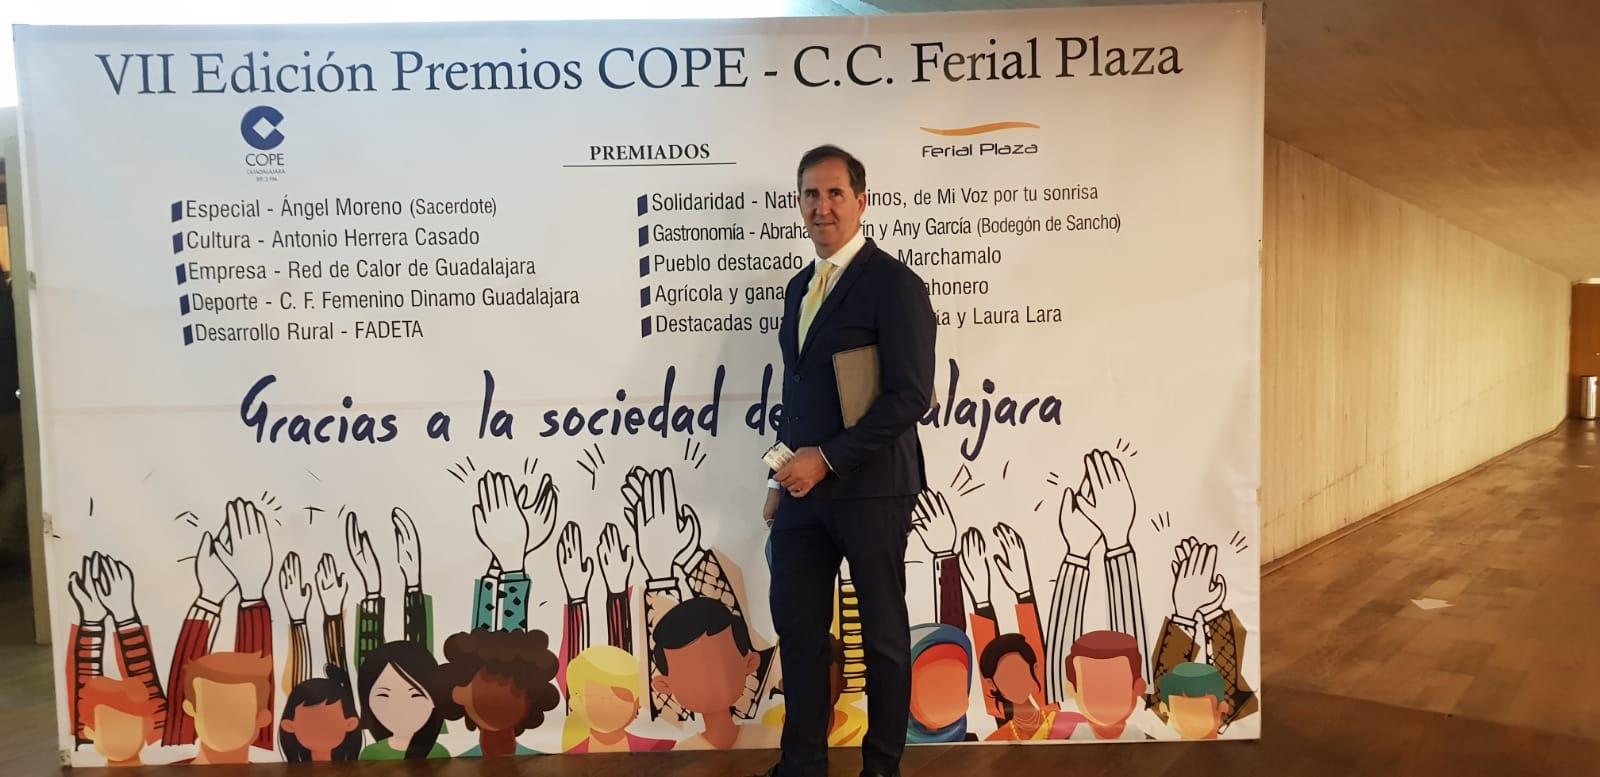 Red de Calor de Guadalajara, premio Empresa Cope Guadalajara 2020